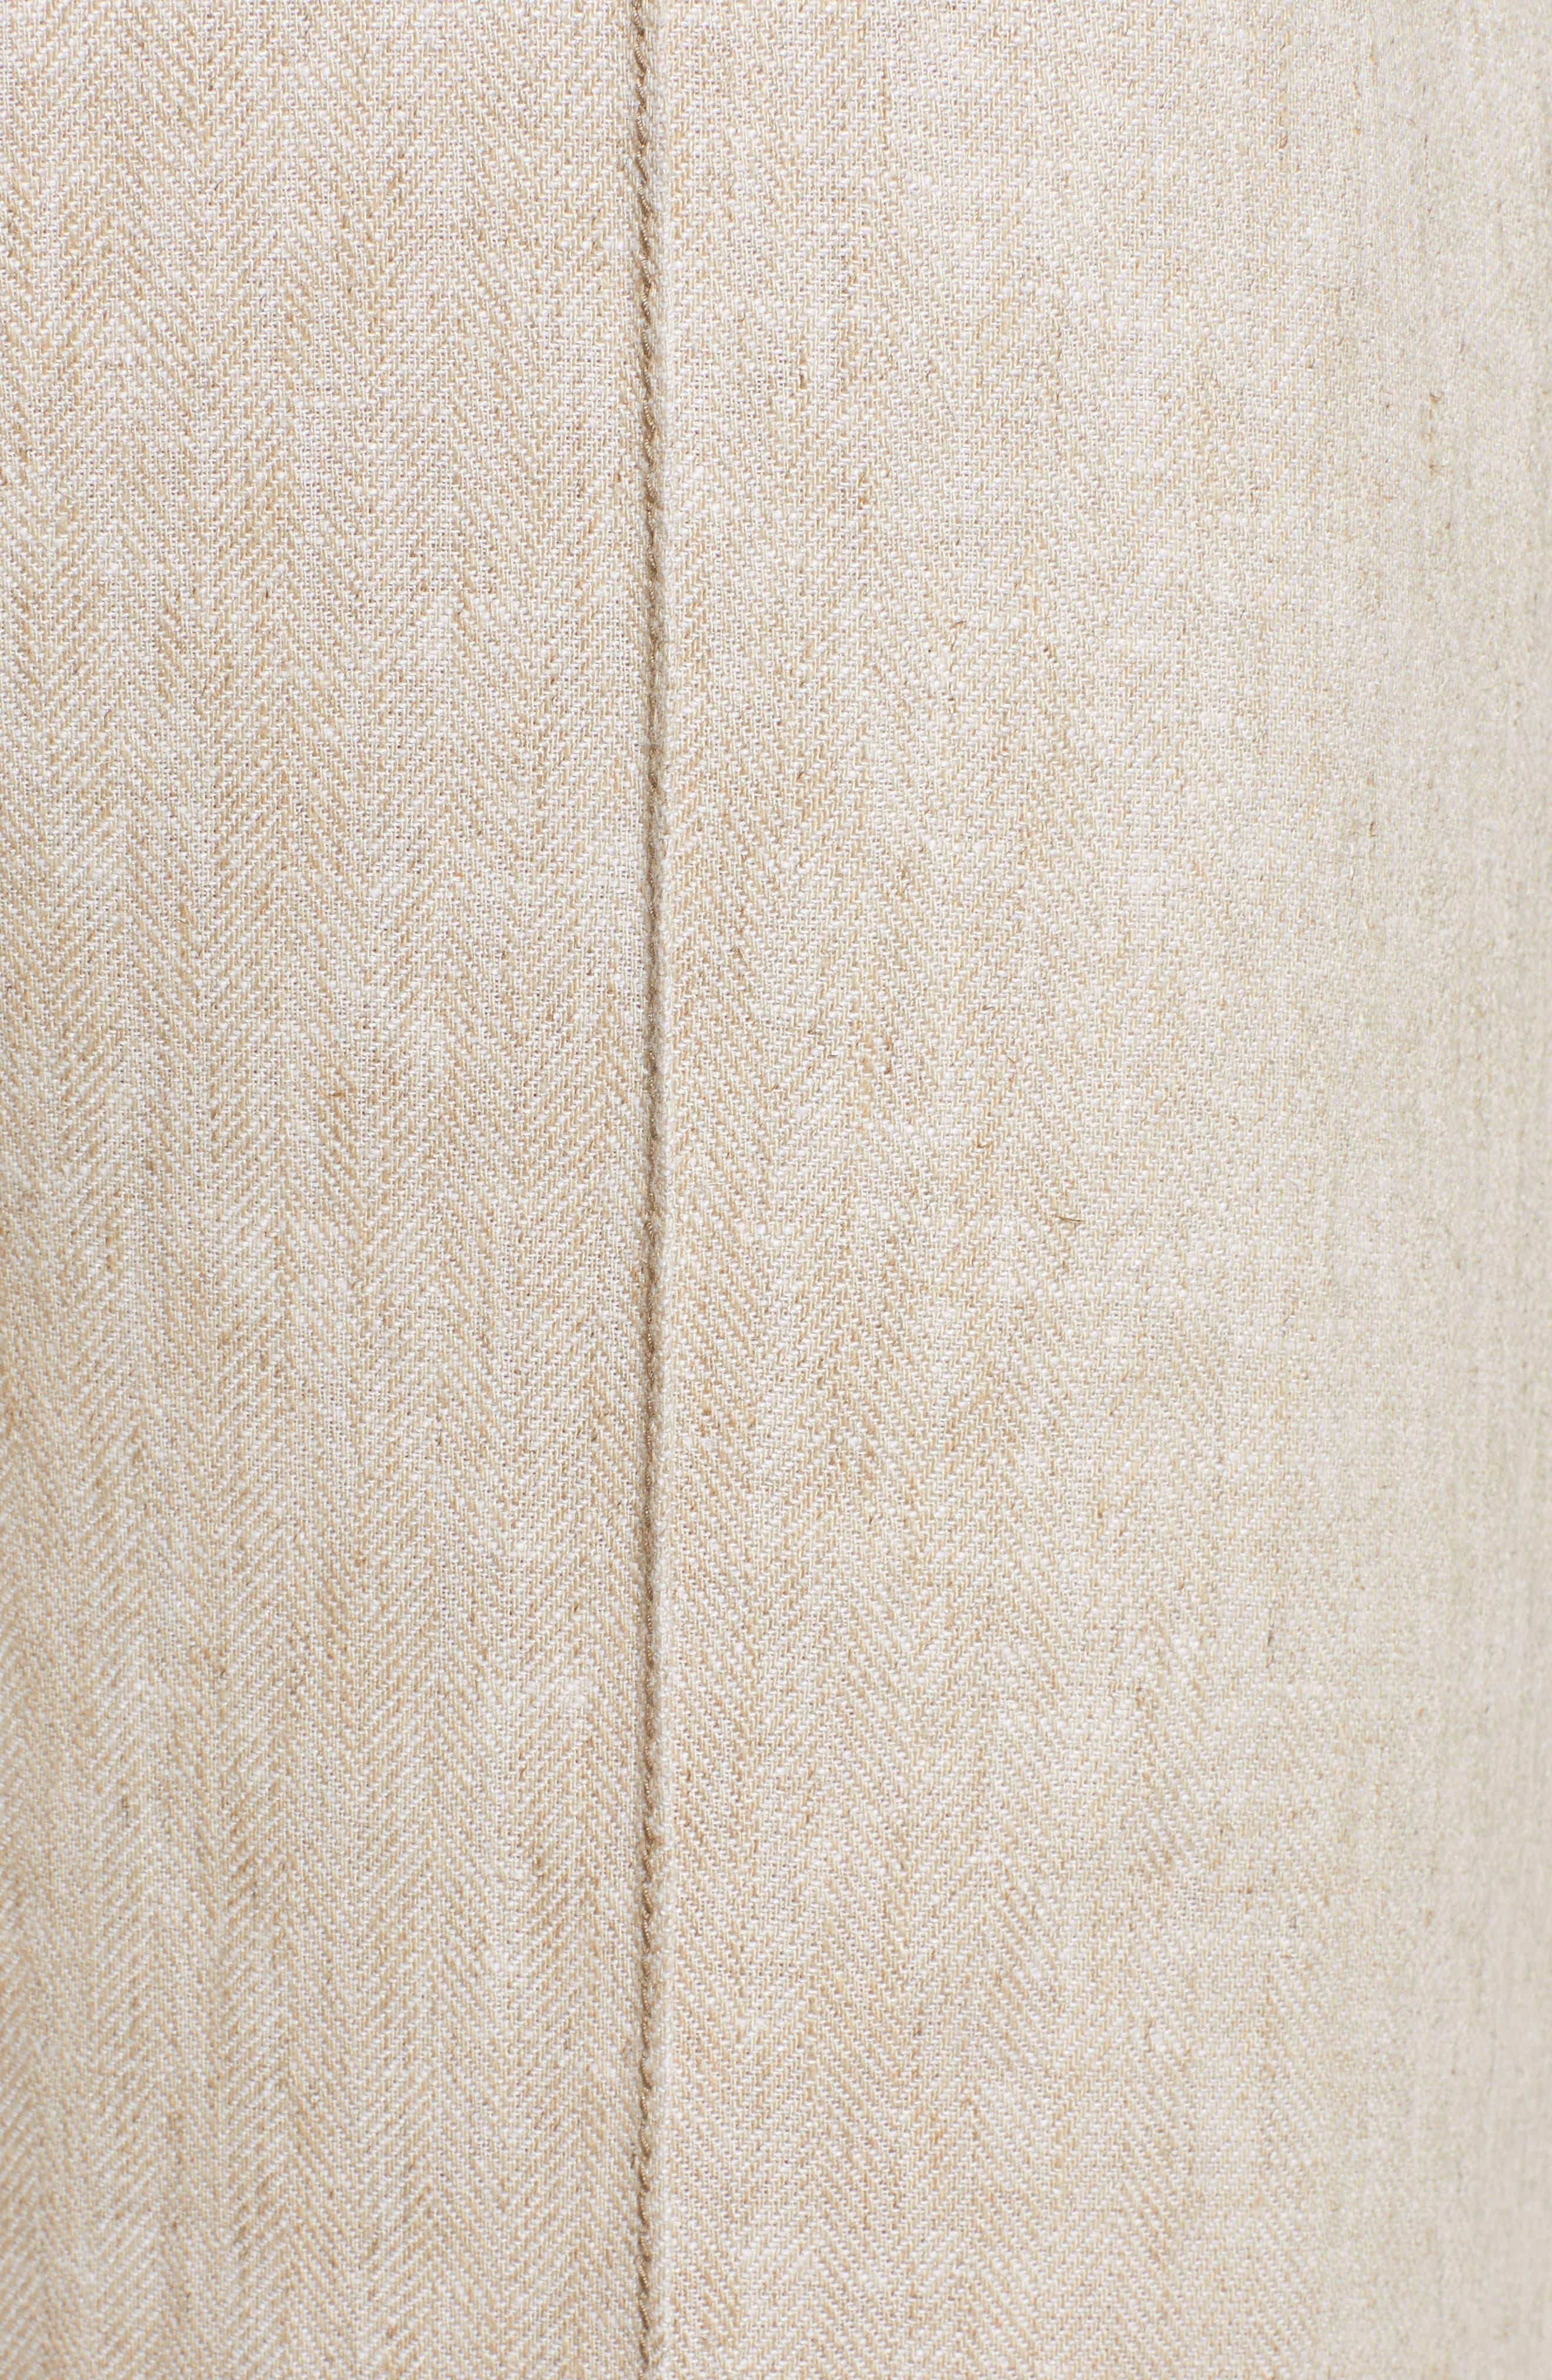 CHRISELLE LIM COLLECTION, Chriselle Lim Toulouse Wide Leg Crop Trousers, Alternate thumbnail 6, color, OATMEAL